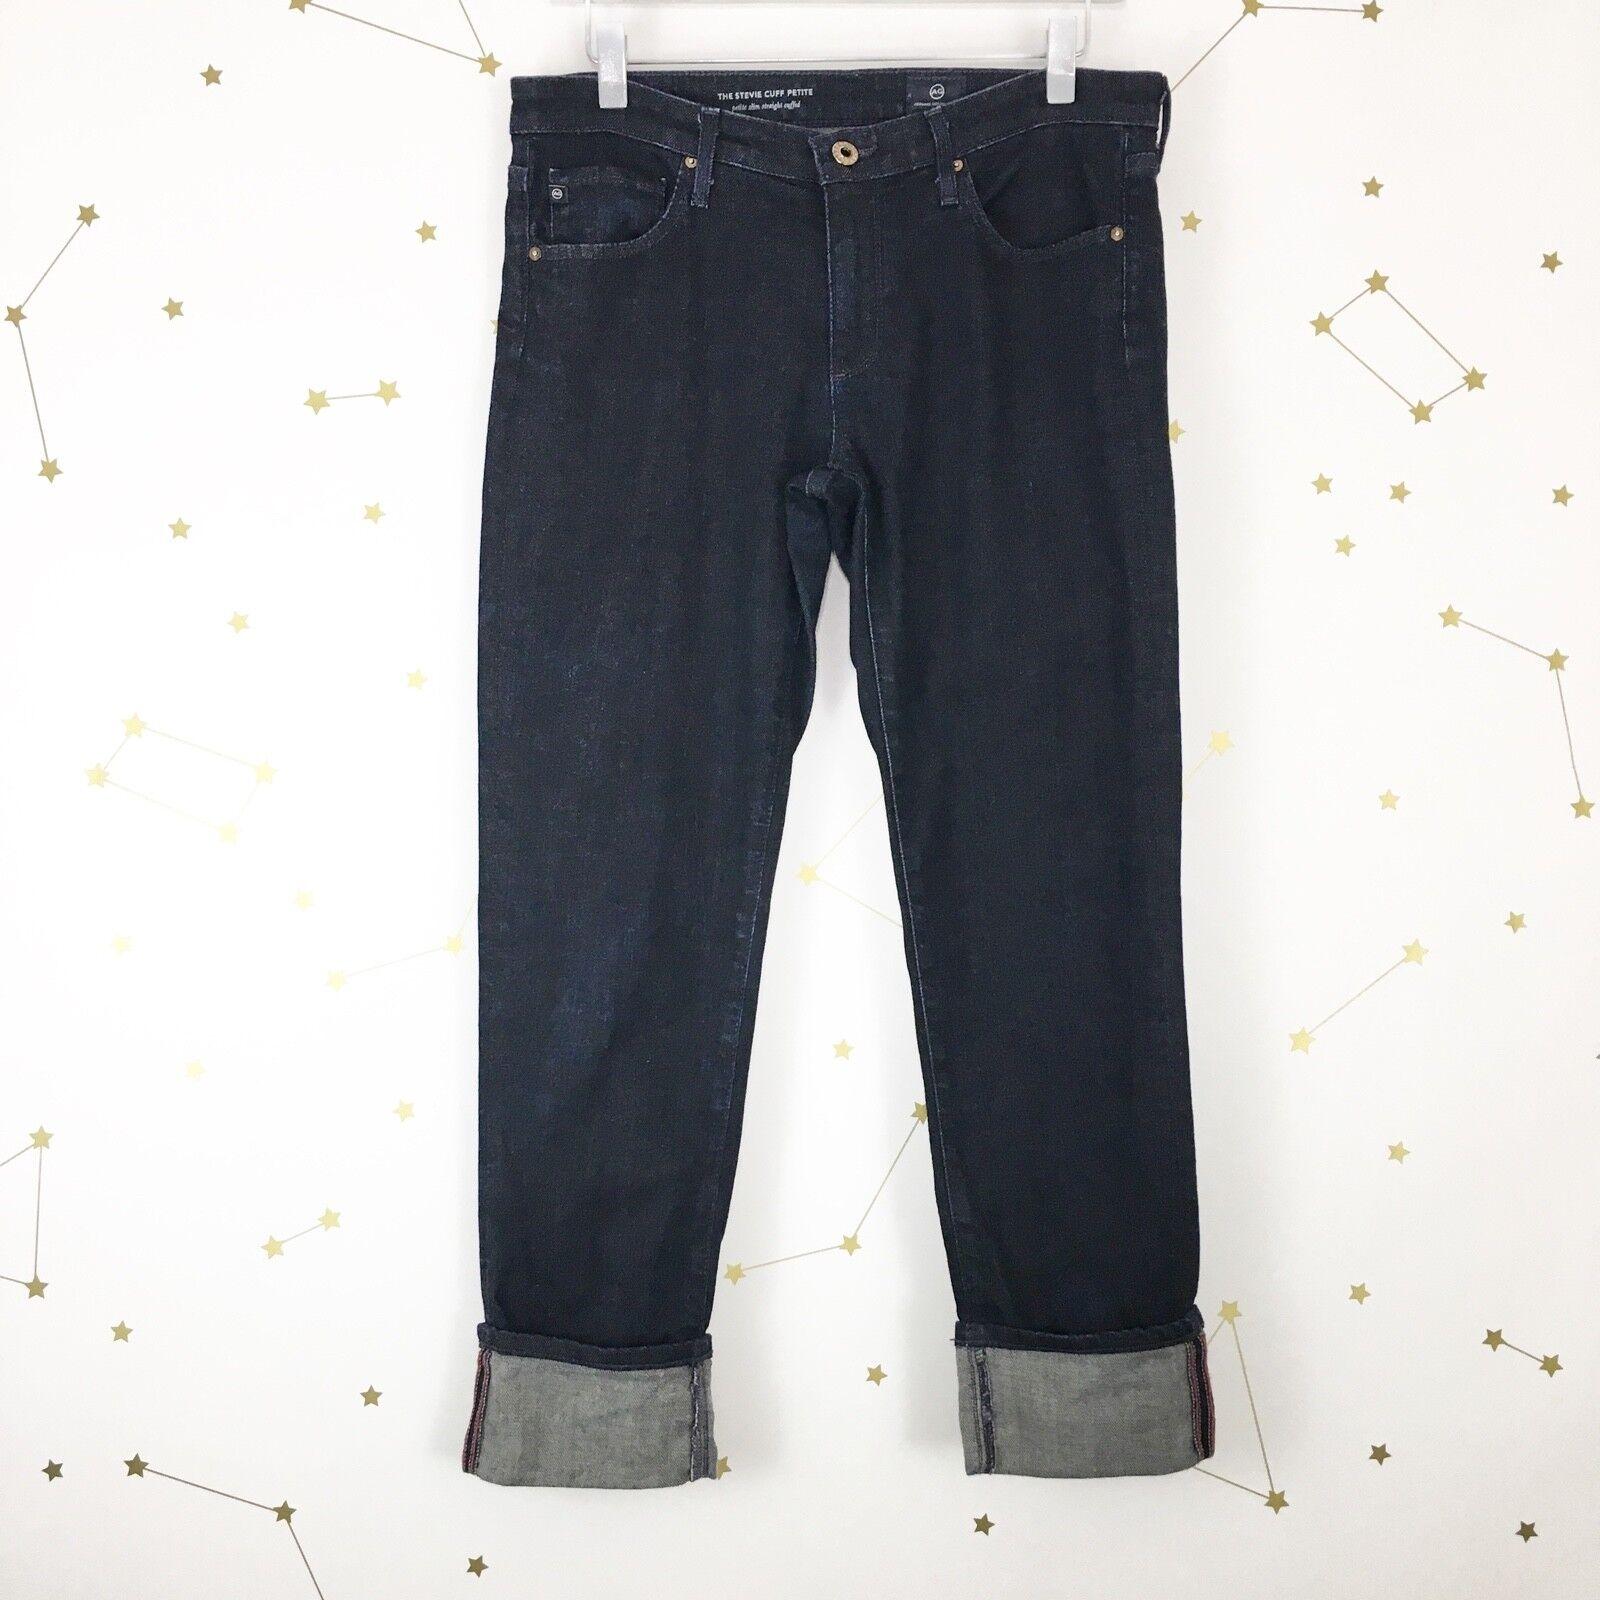 AG Adriano goldschmied Stevie Jeans Sz 29 Petite Dark Wash Slim Straight Cuffed